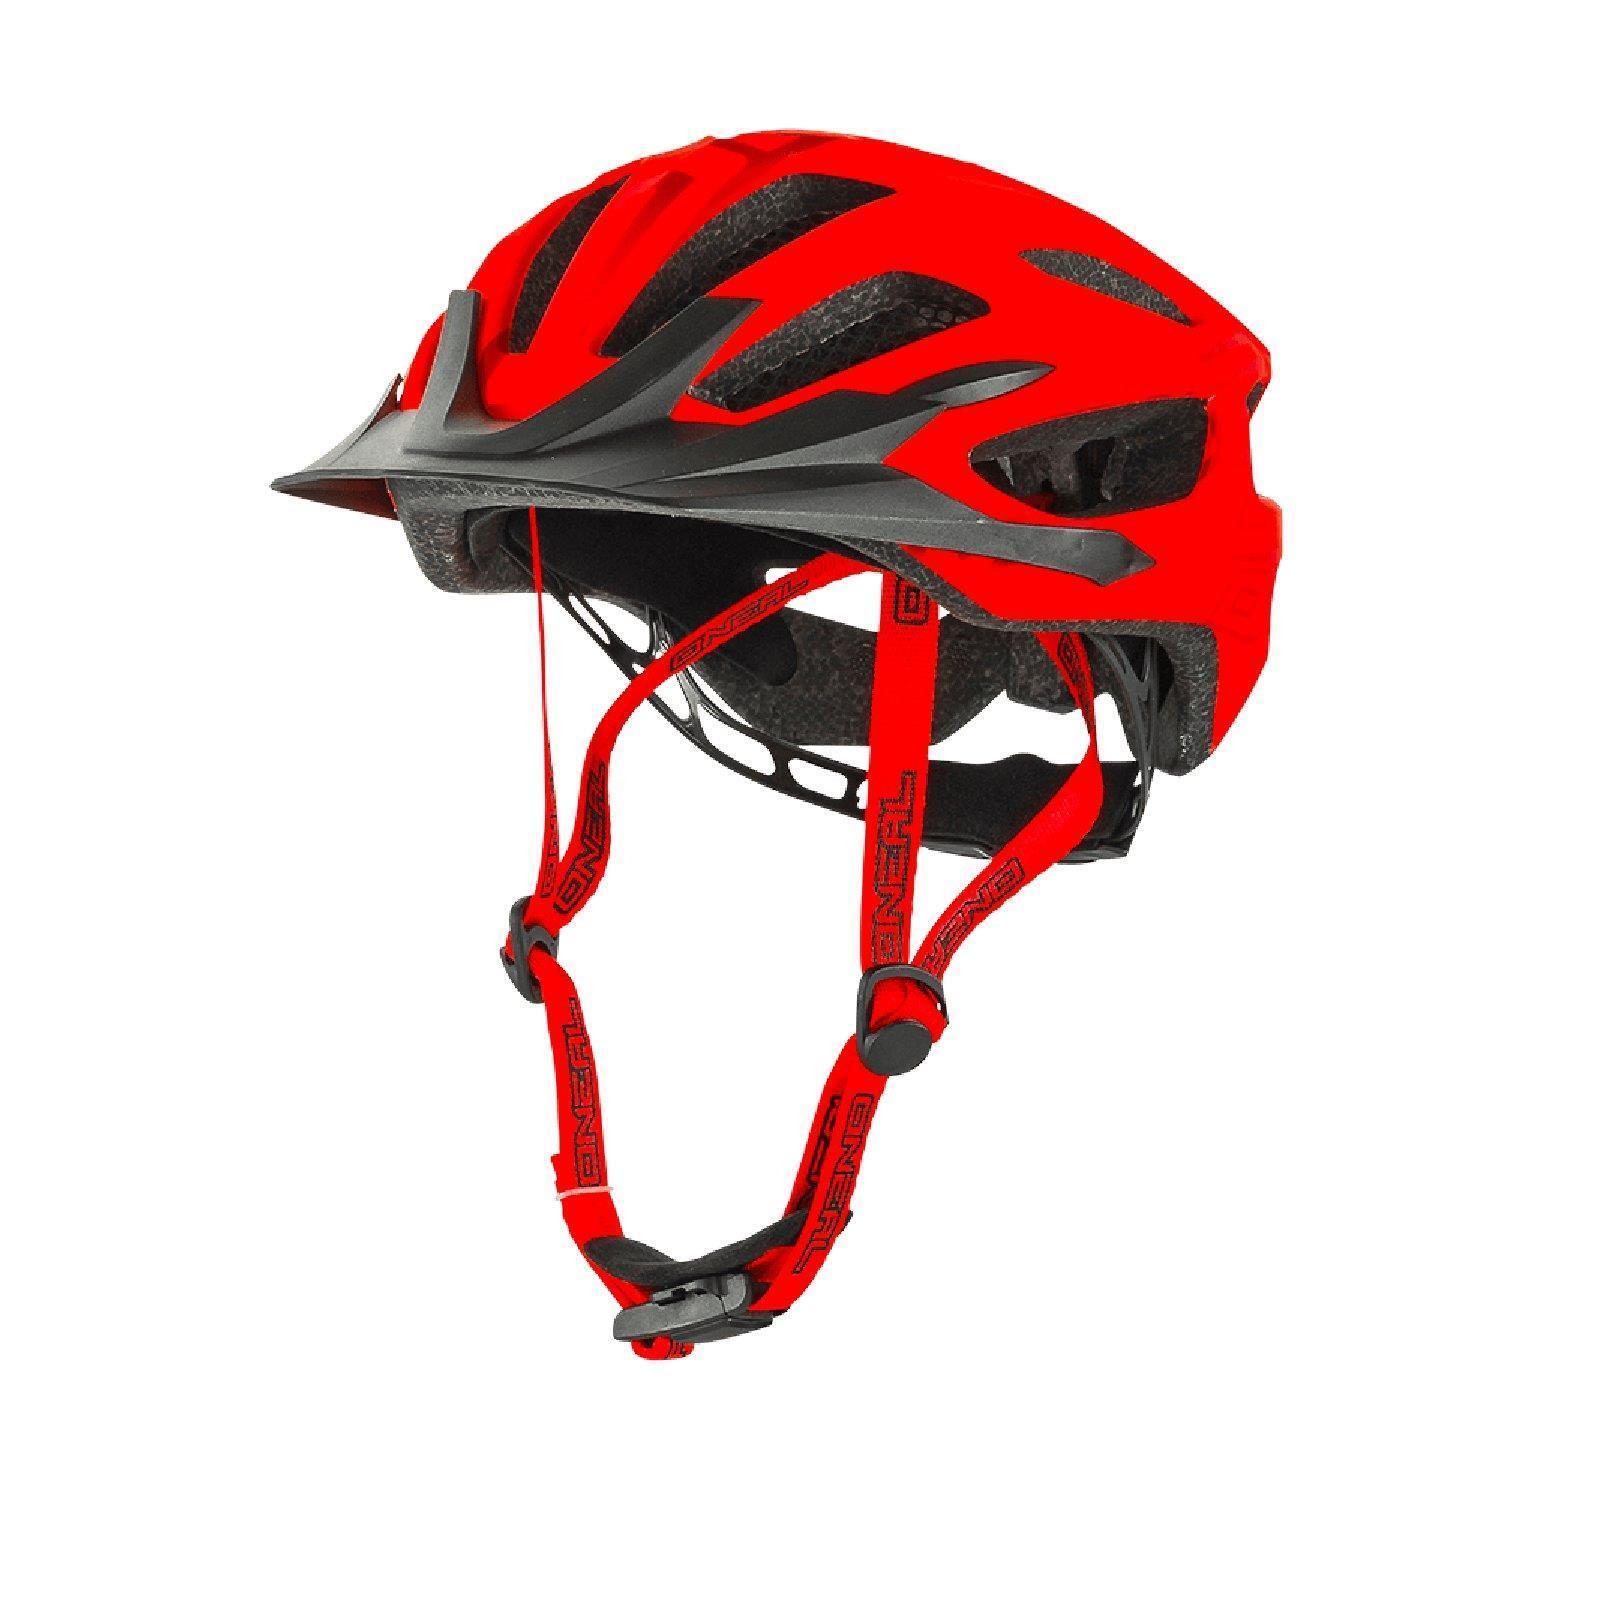 ONEAL Q RL Helmet MTB rot All Mountain Fahrrad Enduro Trail Fahrrad on Freeride DH